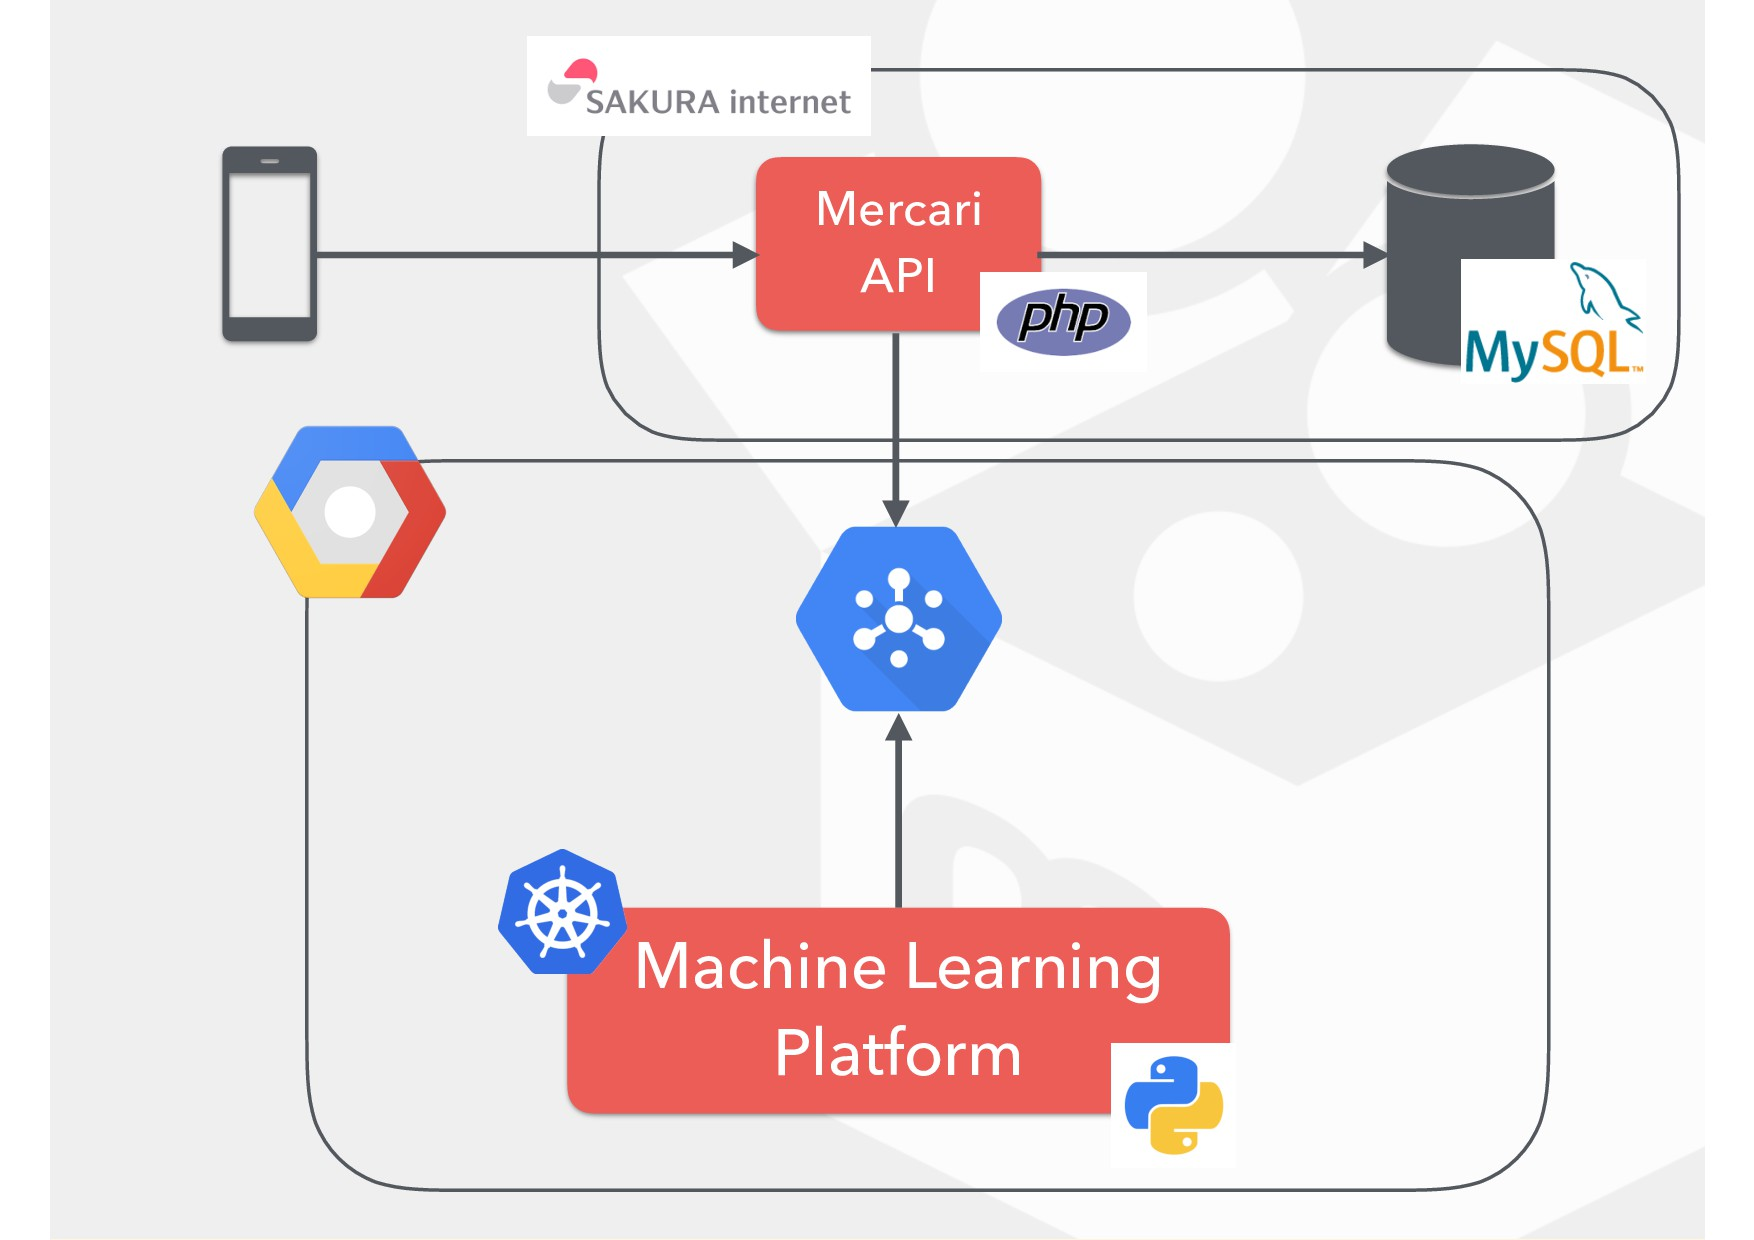 Mercari API Machine Learning Platform